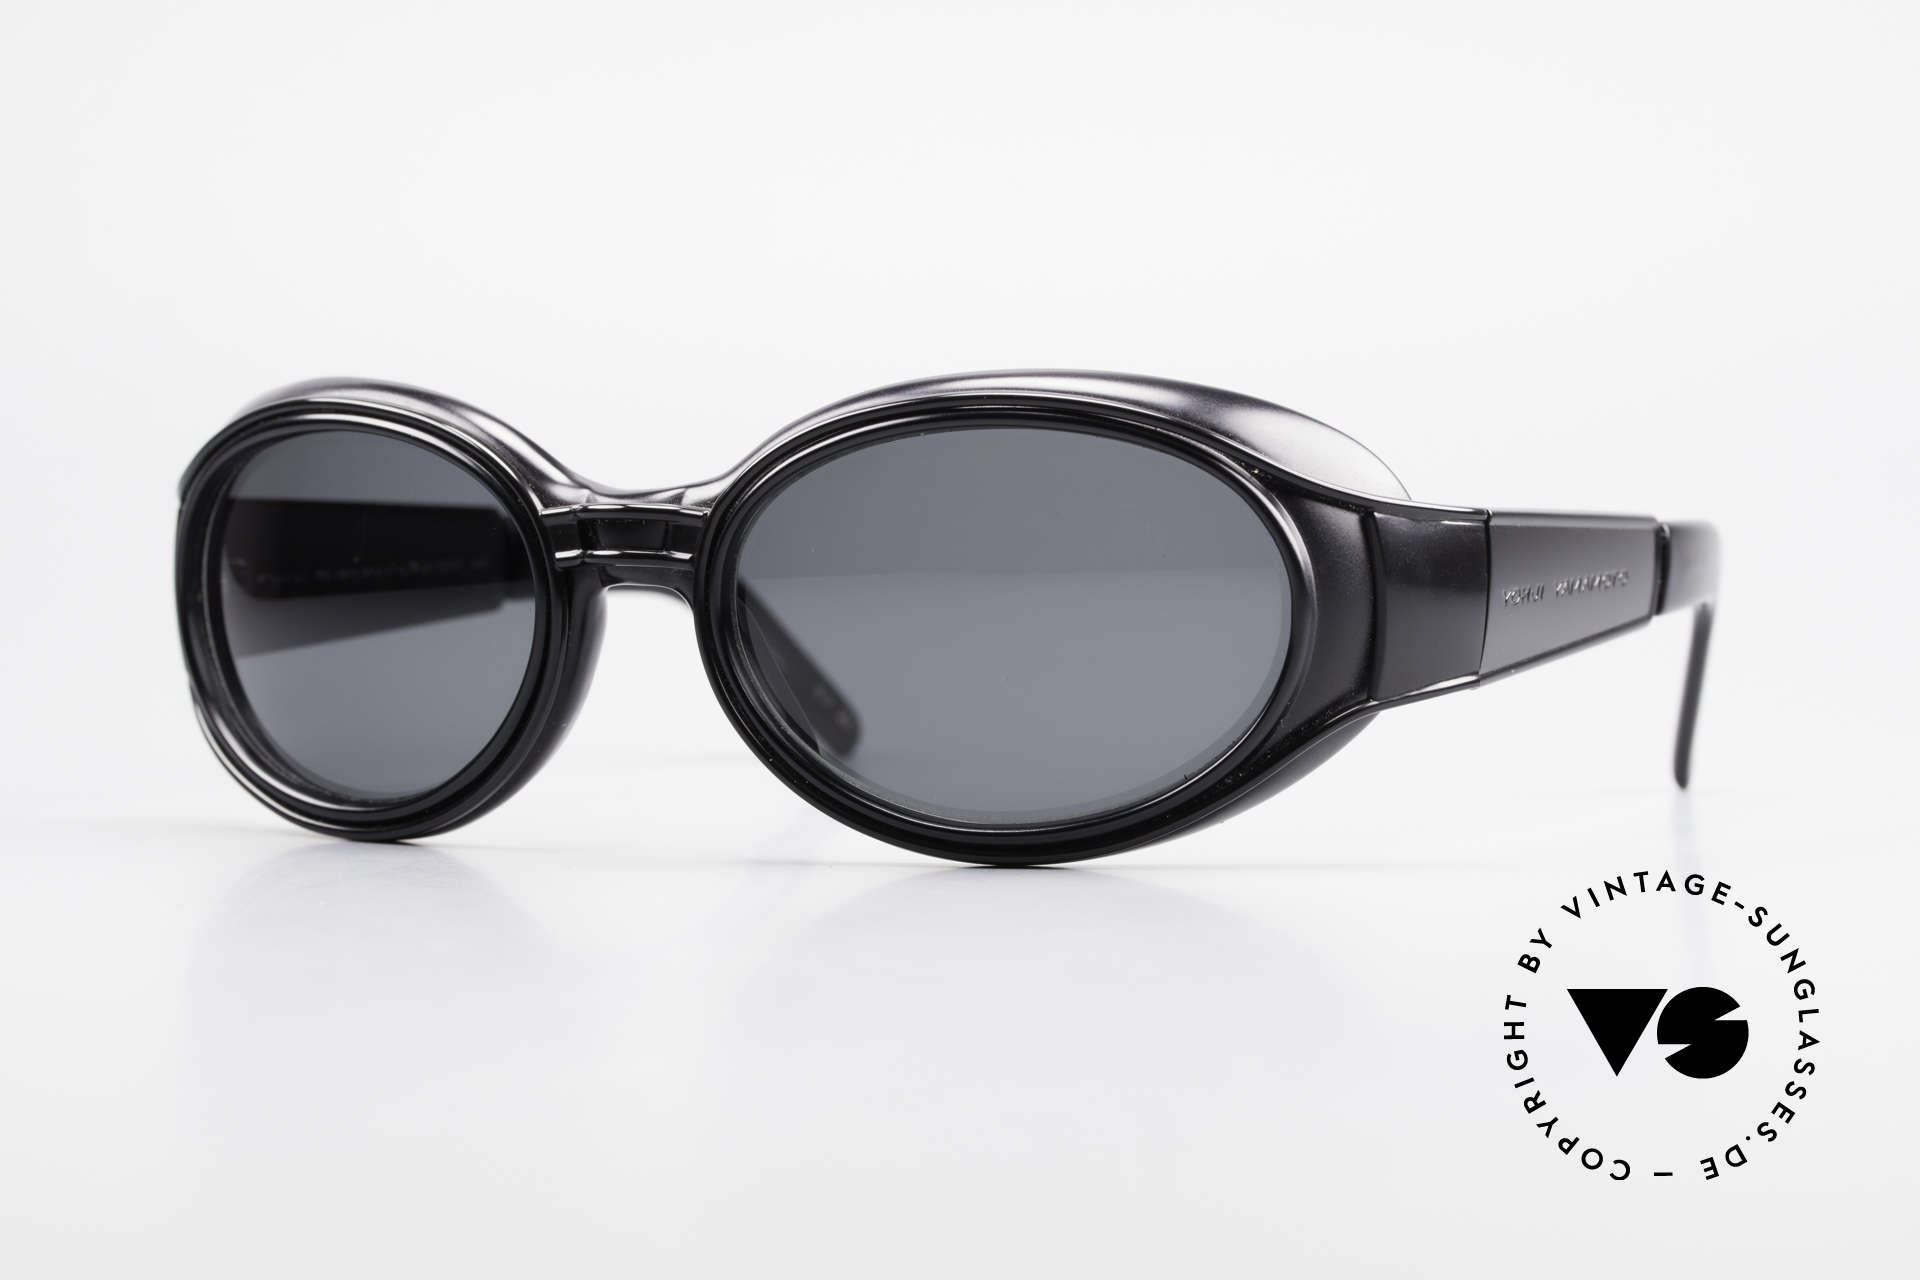 Yohji Yamamoto 52-6202 Sporty XL Designer Sunglasses, ultra RARE vintage Yohji Yamamoto shades of the 90's, Made for Men and Women